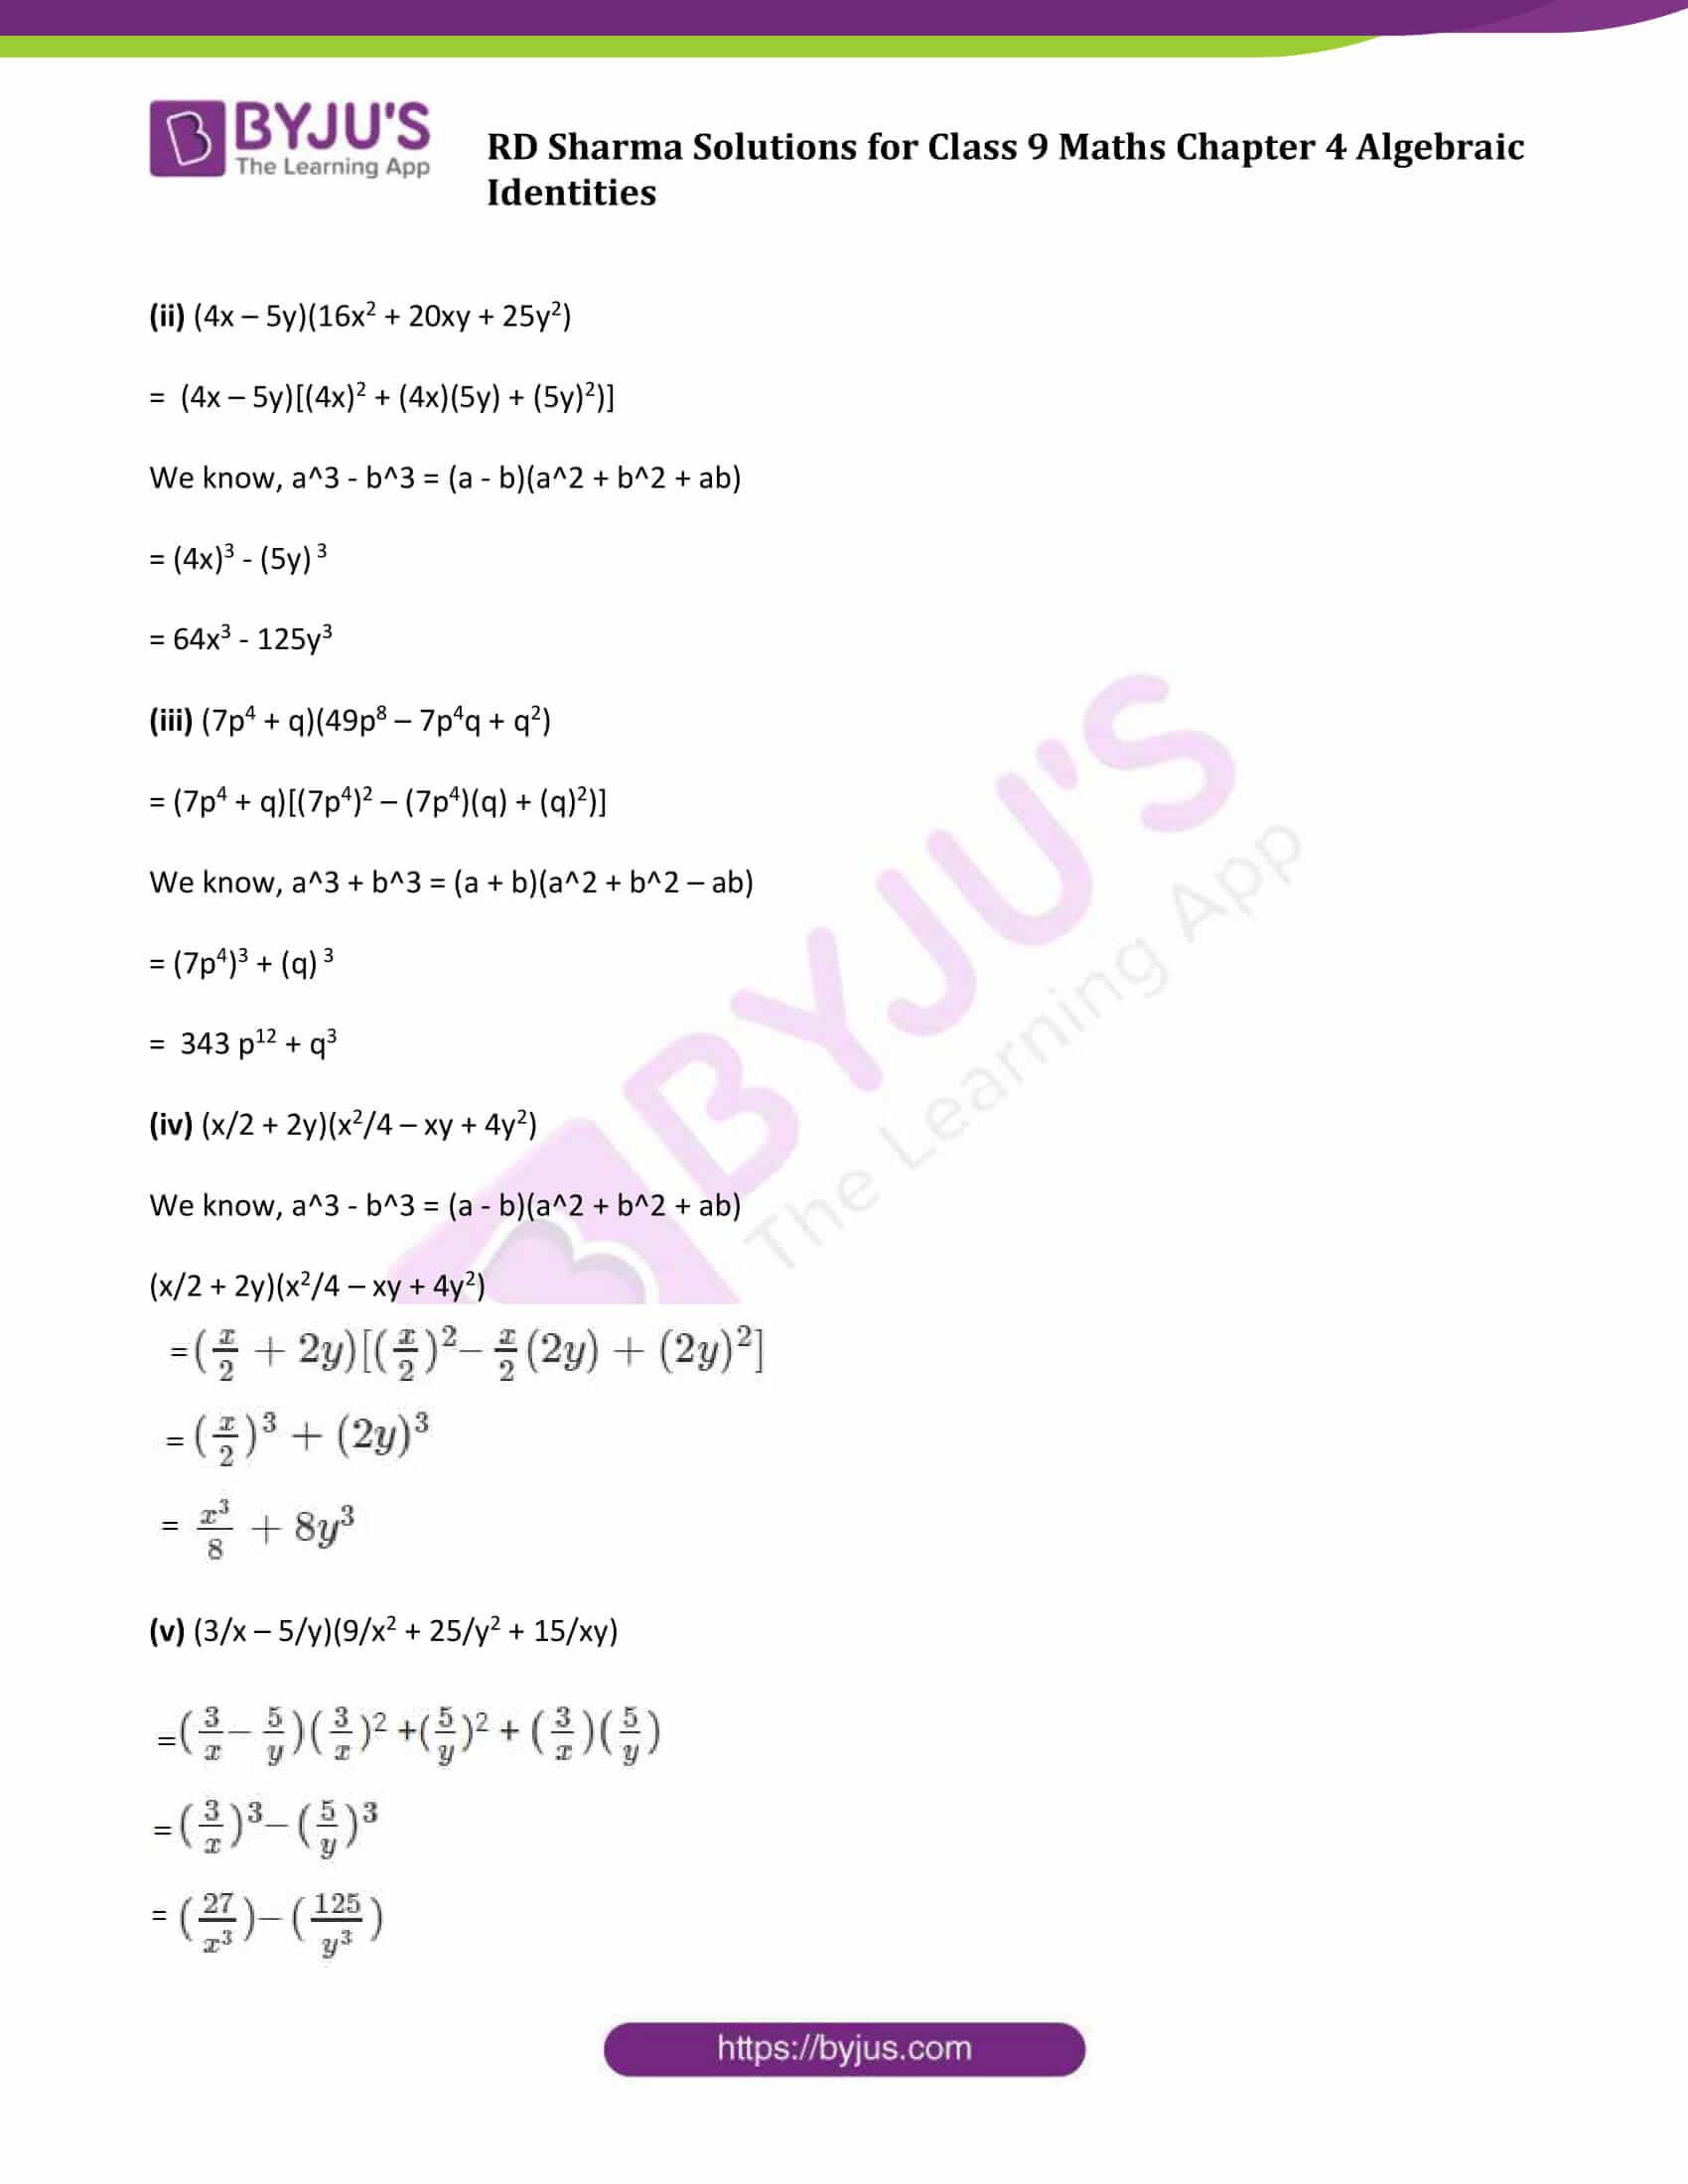 RD Sharma Solution class 9 Maths Chapter 4 Algebraic Identities 19